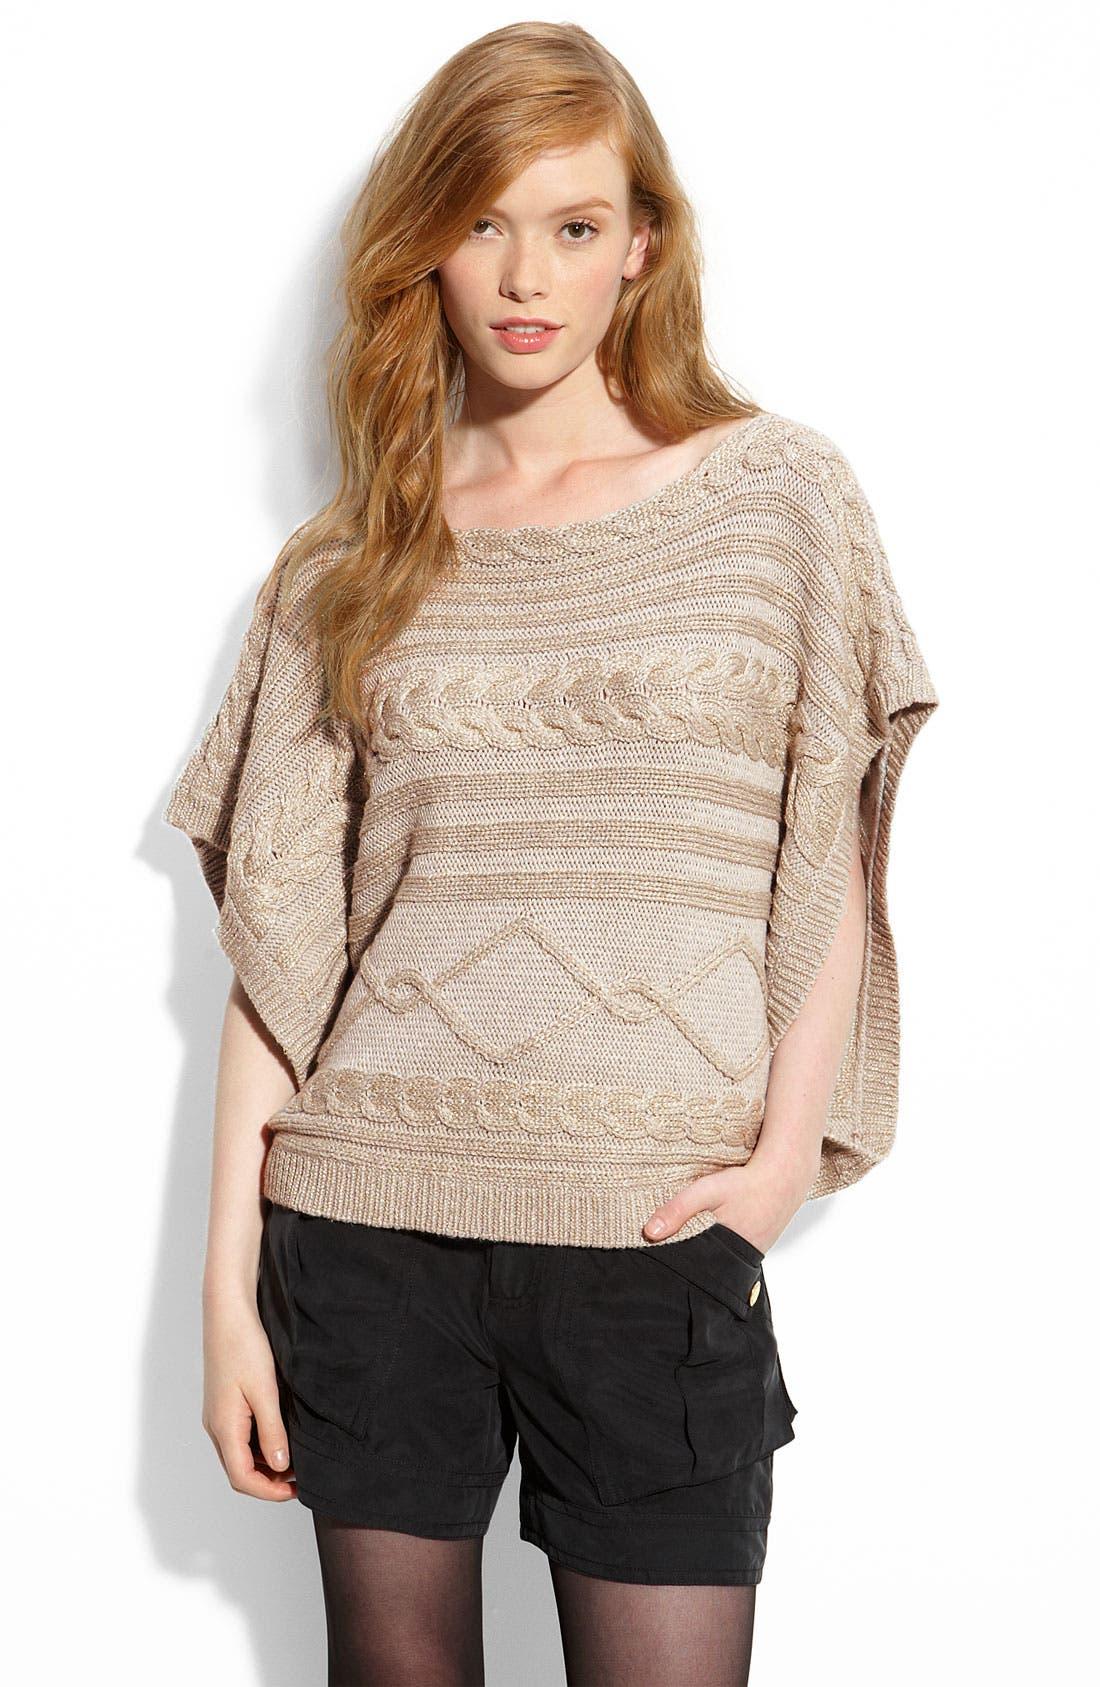 Alternate Image 1 Selected - LaROK 'Jillian' Metallic Sweater Knit Poncho